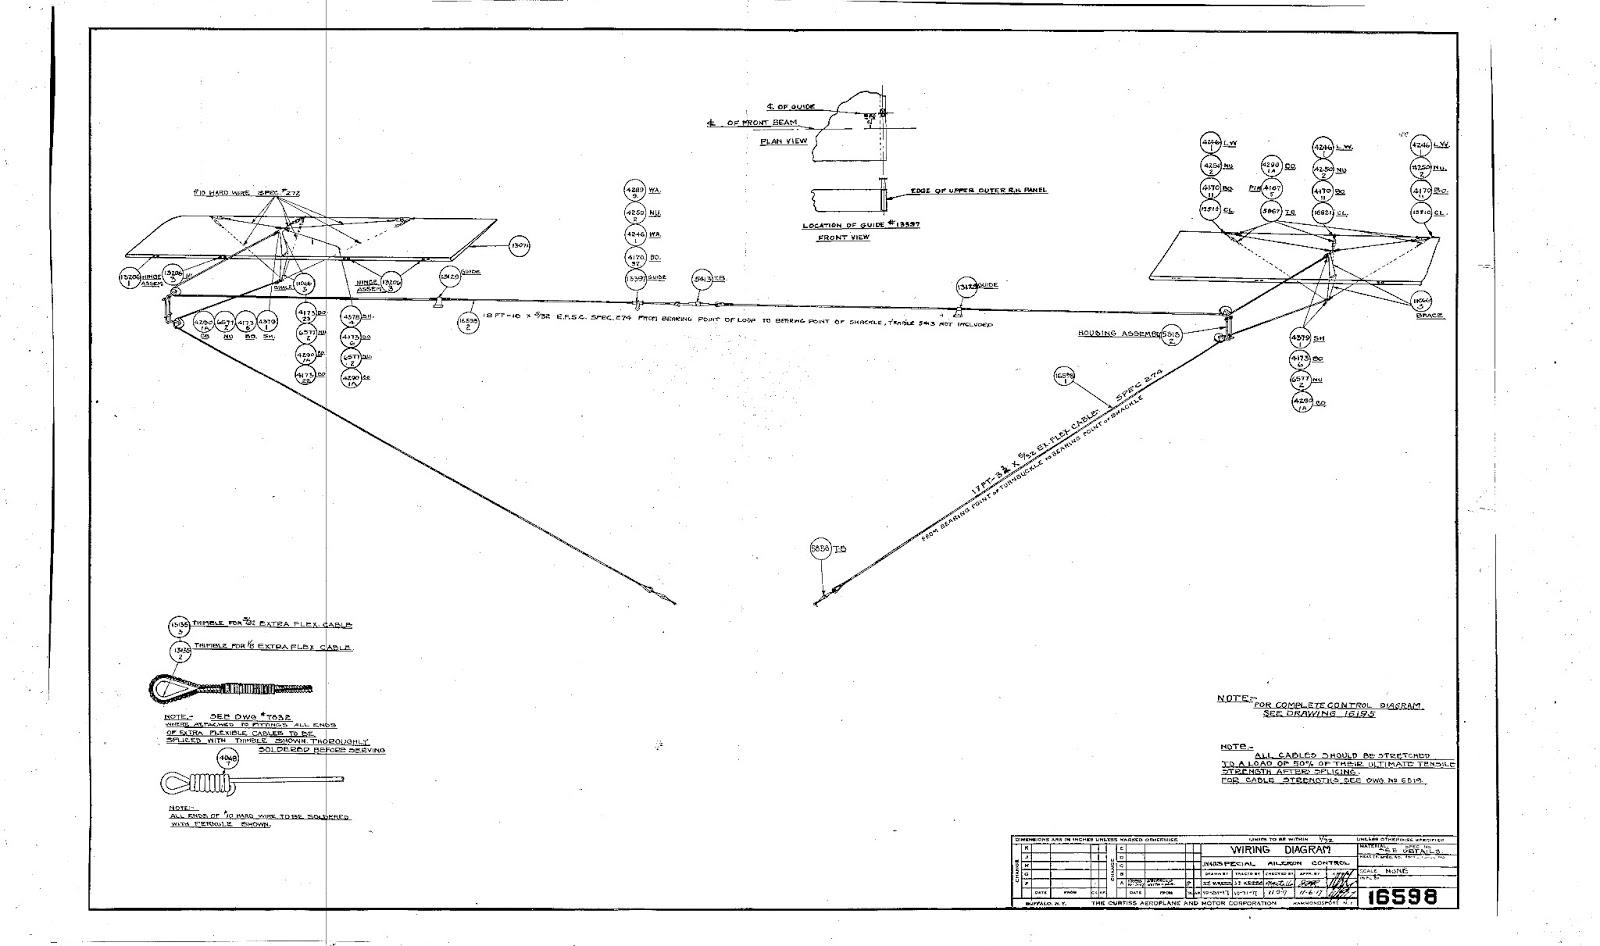 medium resolution of aircraft magneto wiring diagram aircraft image wiring diagram aircraft magneto wiring image on aircraft magneto wiring